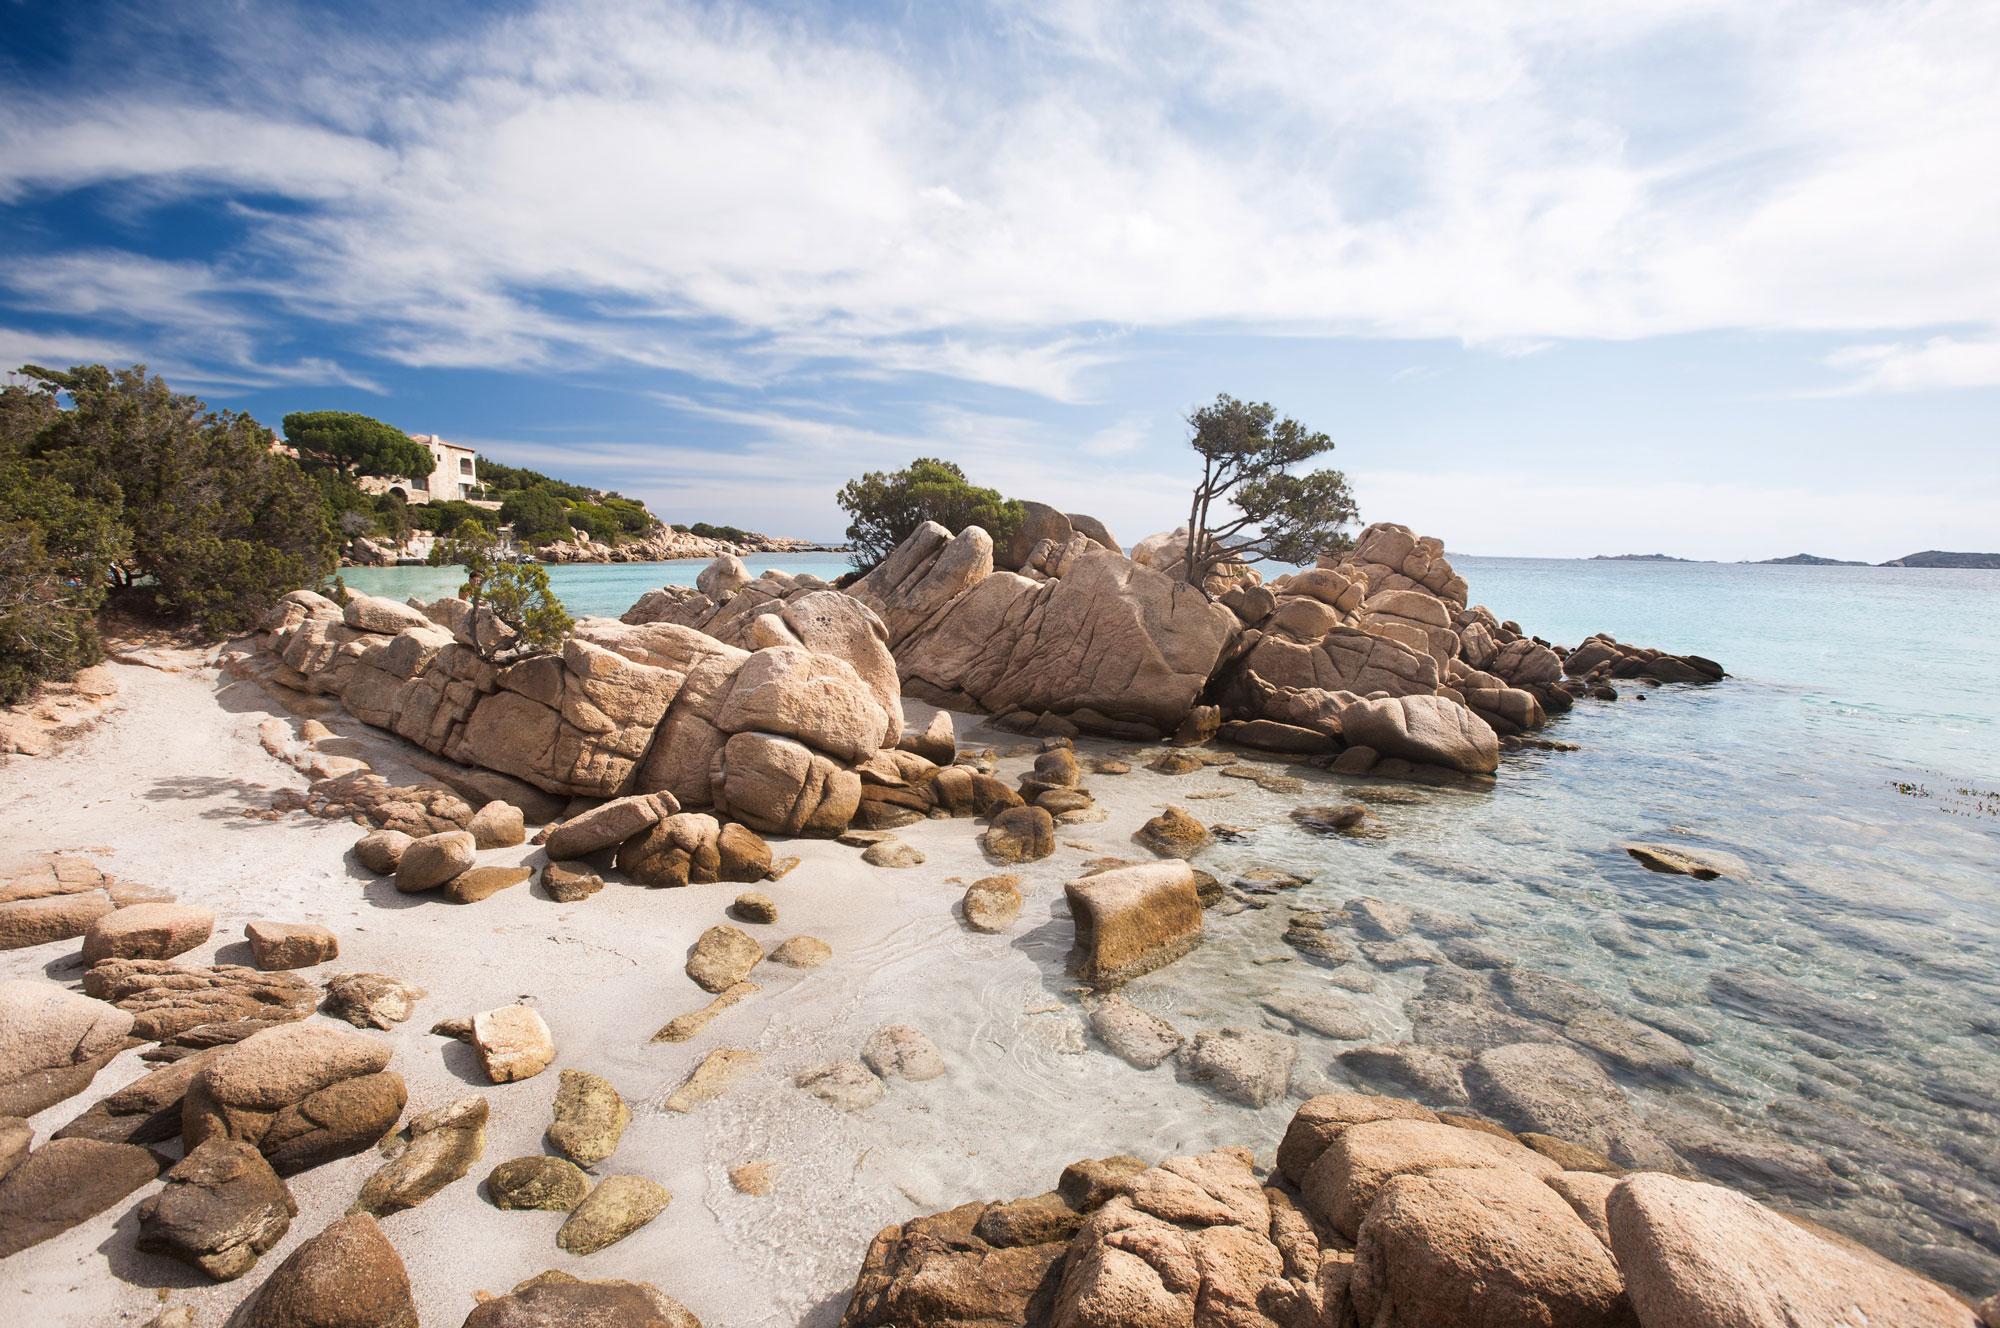 Cala Capriccioli, Costa Smeralda, Sardaigne